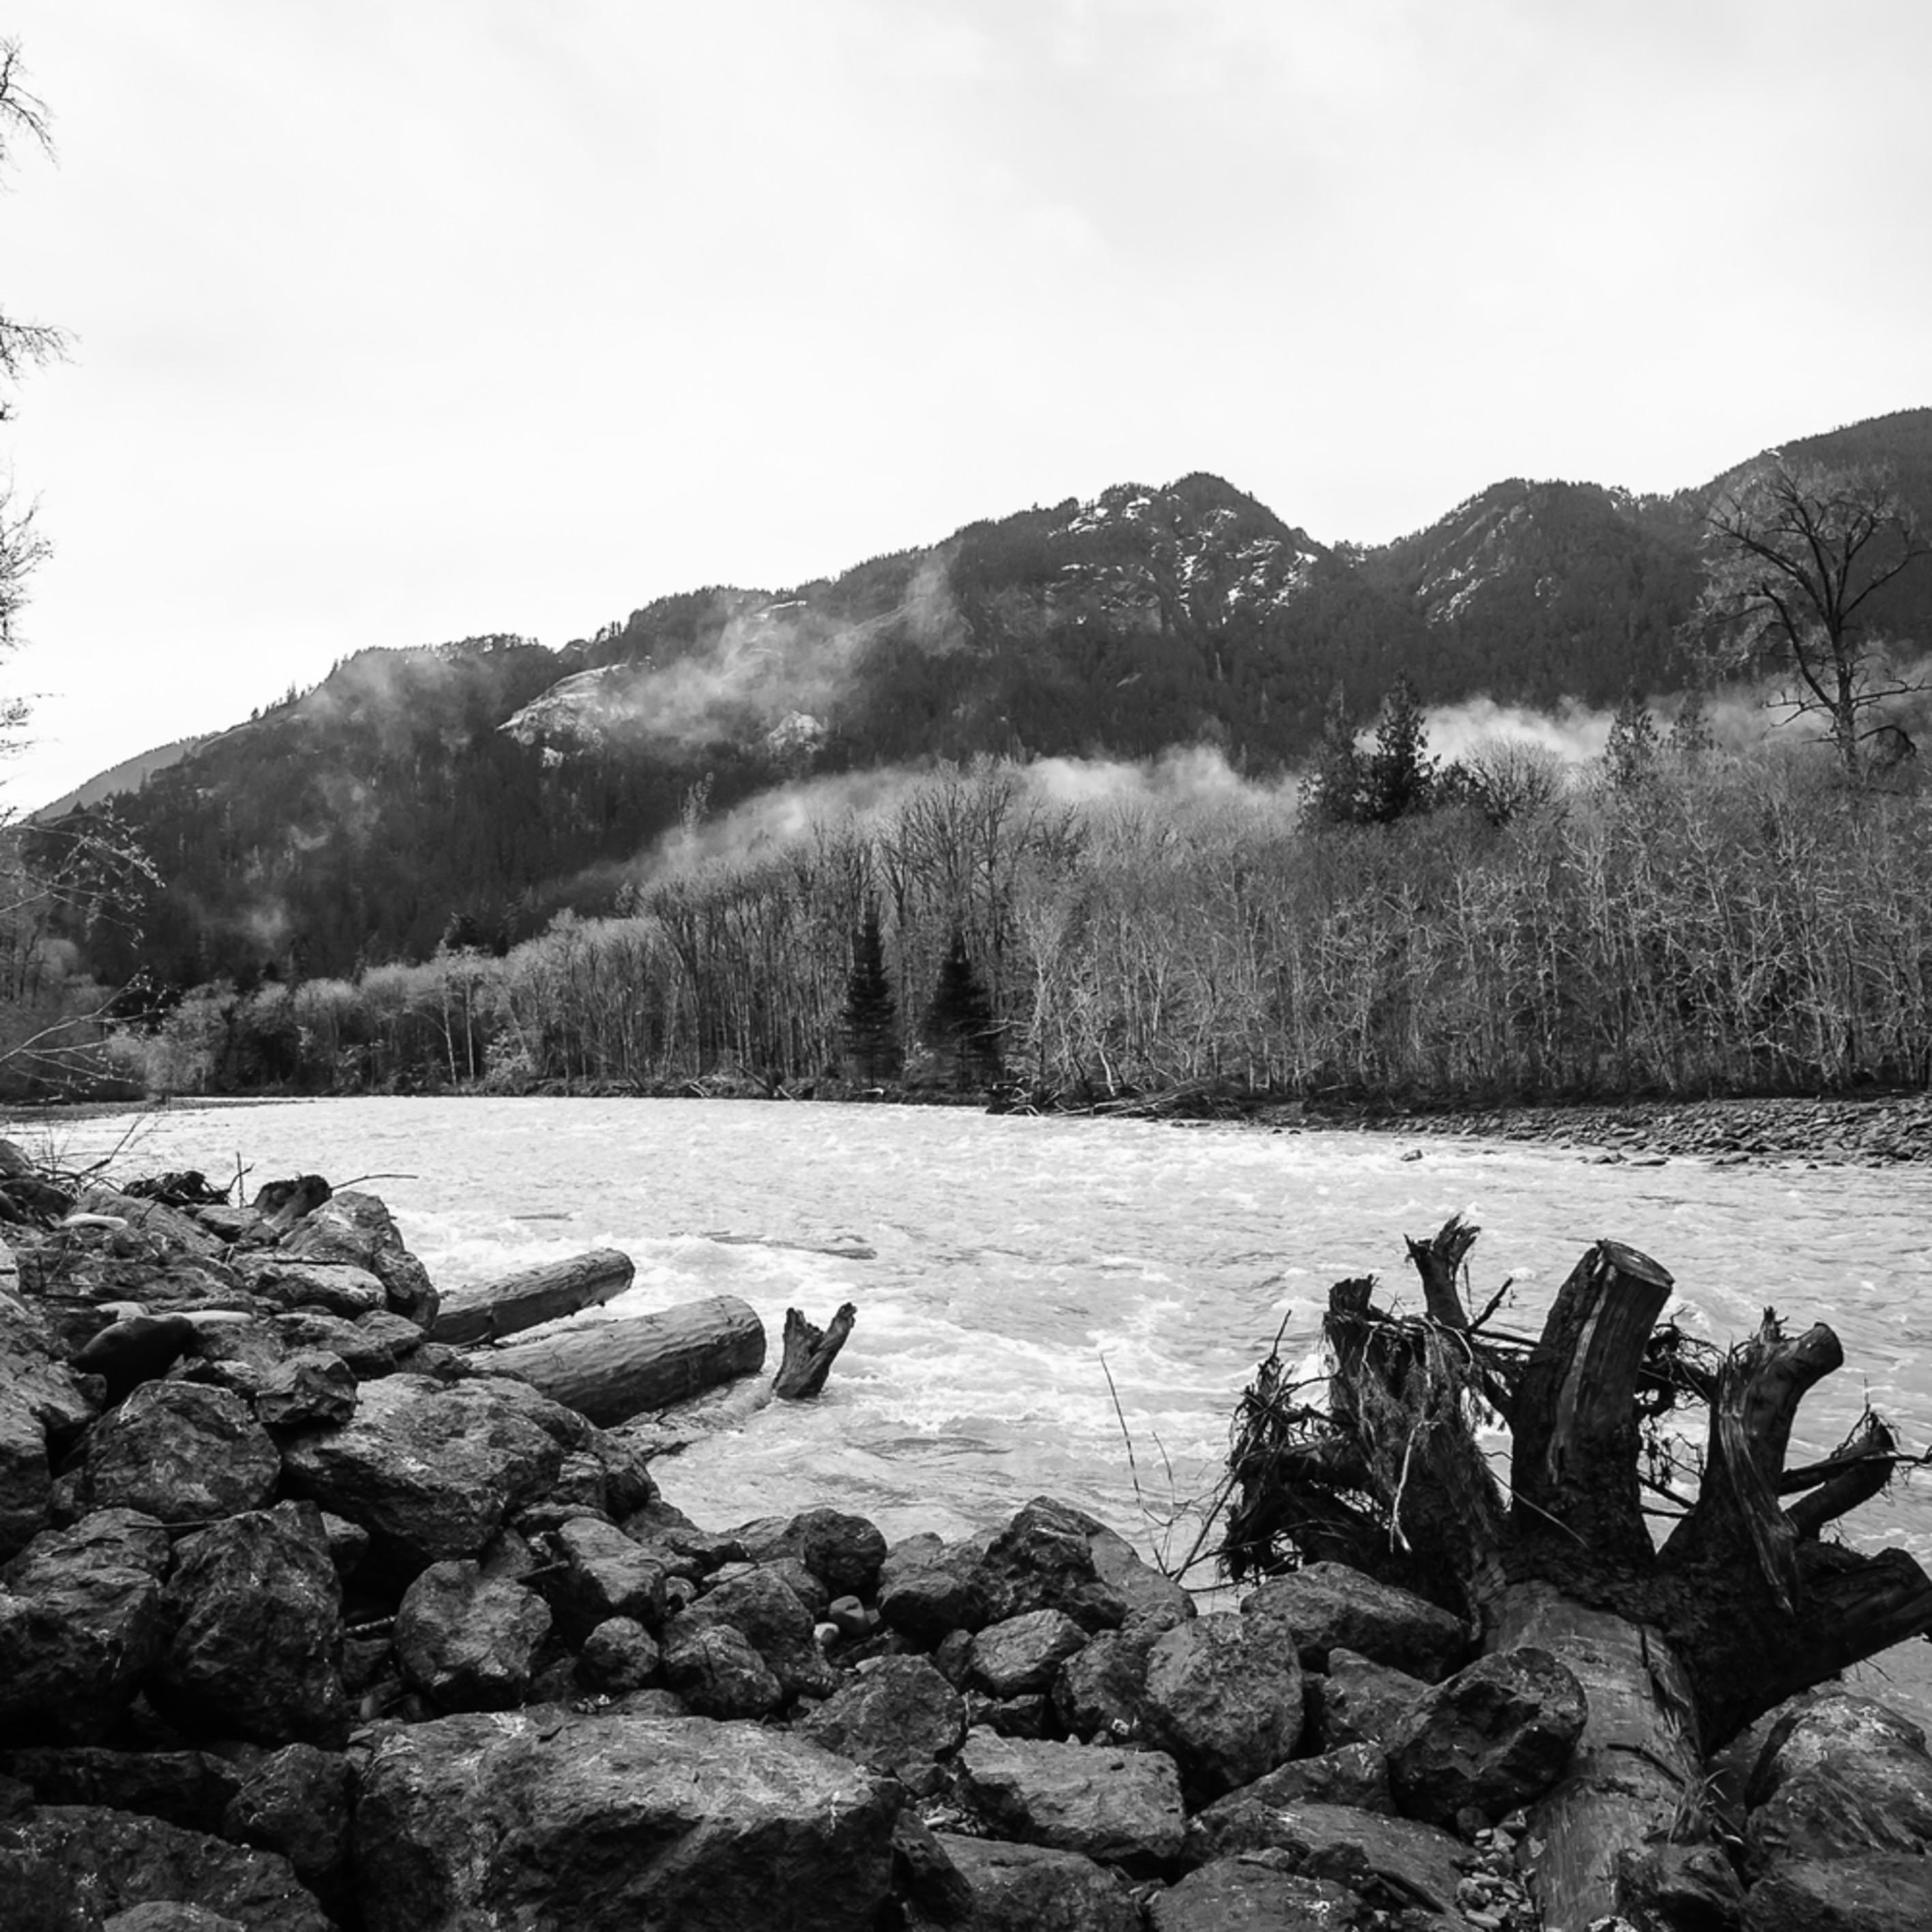 Winter elwha river olympic national park washington 2016 whteip